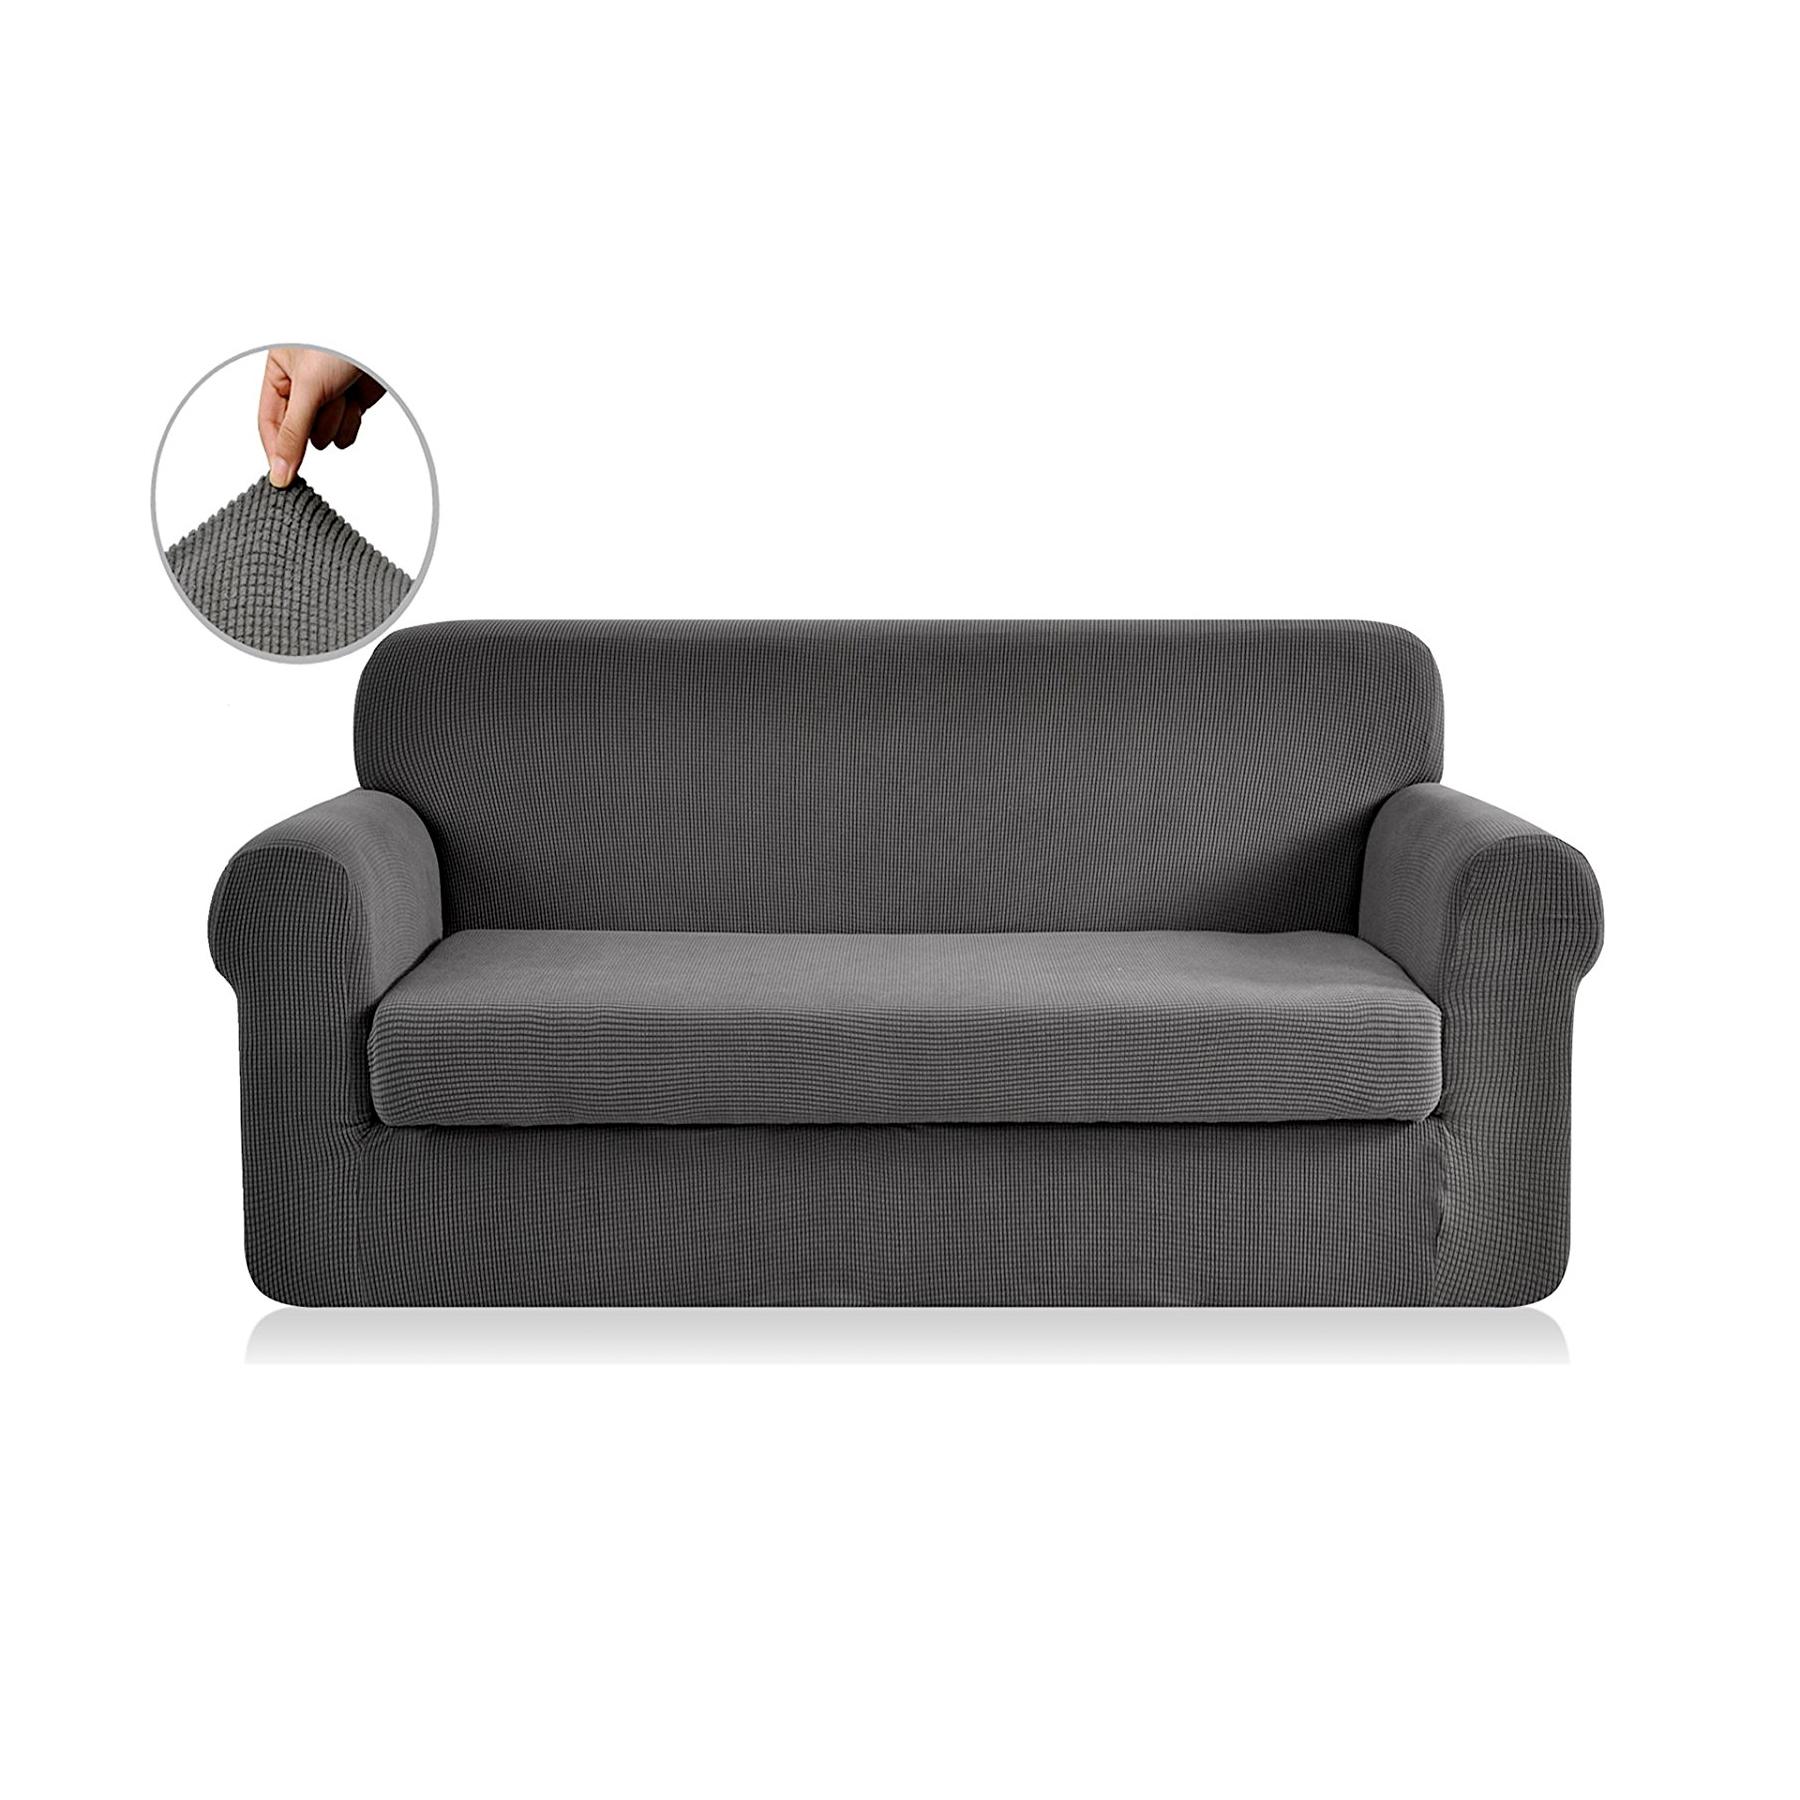 2 Piece Jacquard Polyester Spandex Sofa Slipcover (Sofa, Gray)